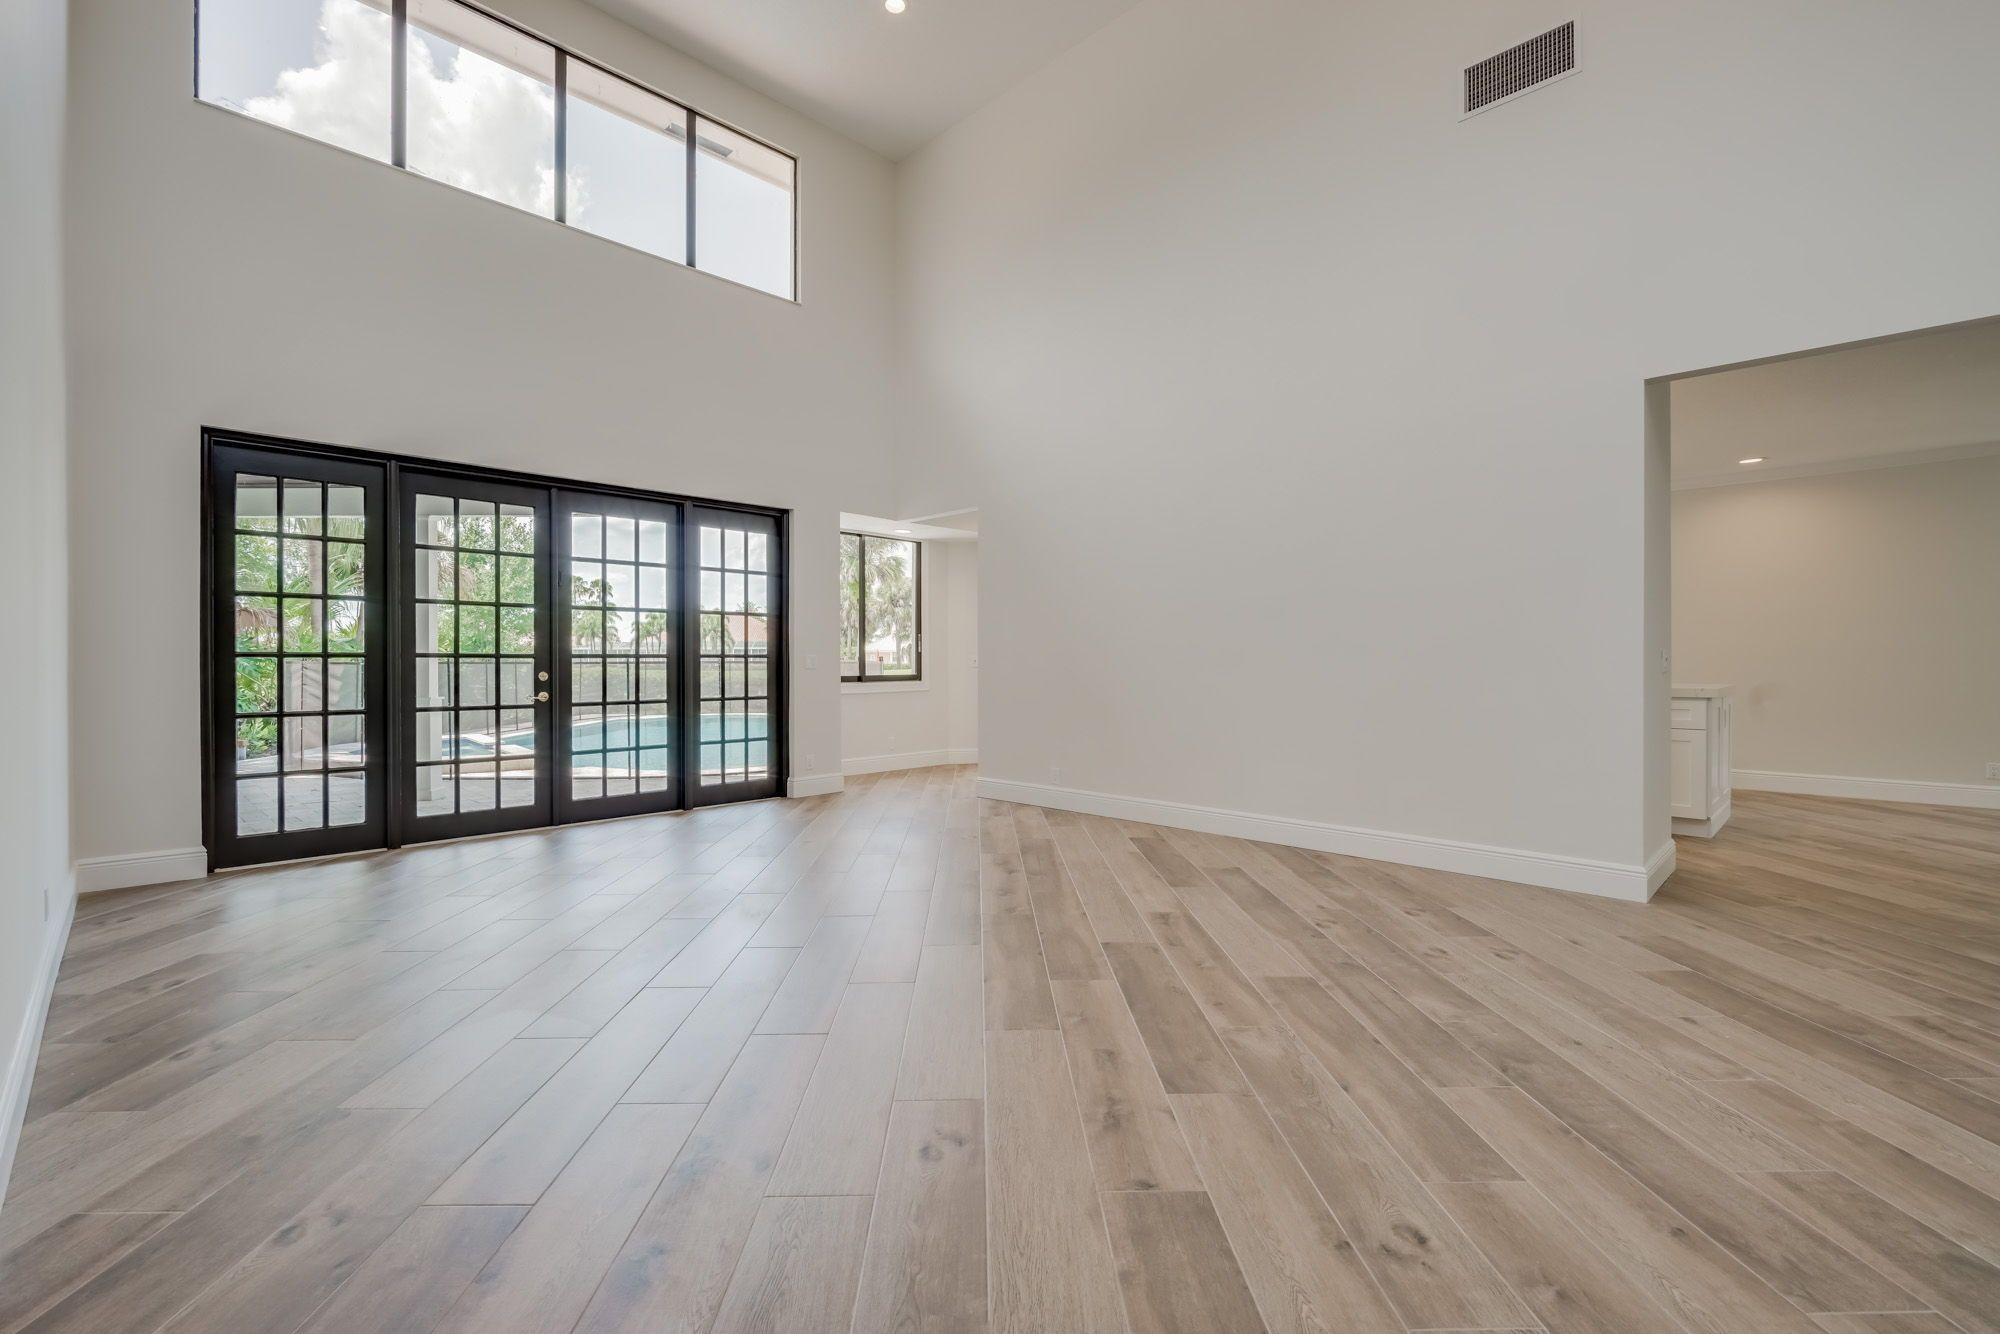 The Living Room Has Soaring 22 Ceilings Massive Clerestory Windows Wide Plank Wood Look Porcelain Wide Plank Hardwood Floors Living Room Designs Great Rooms